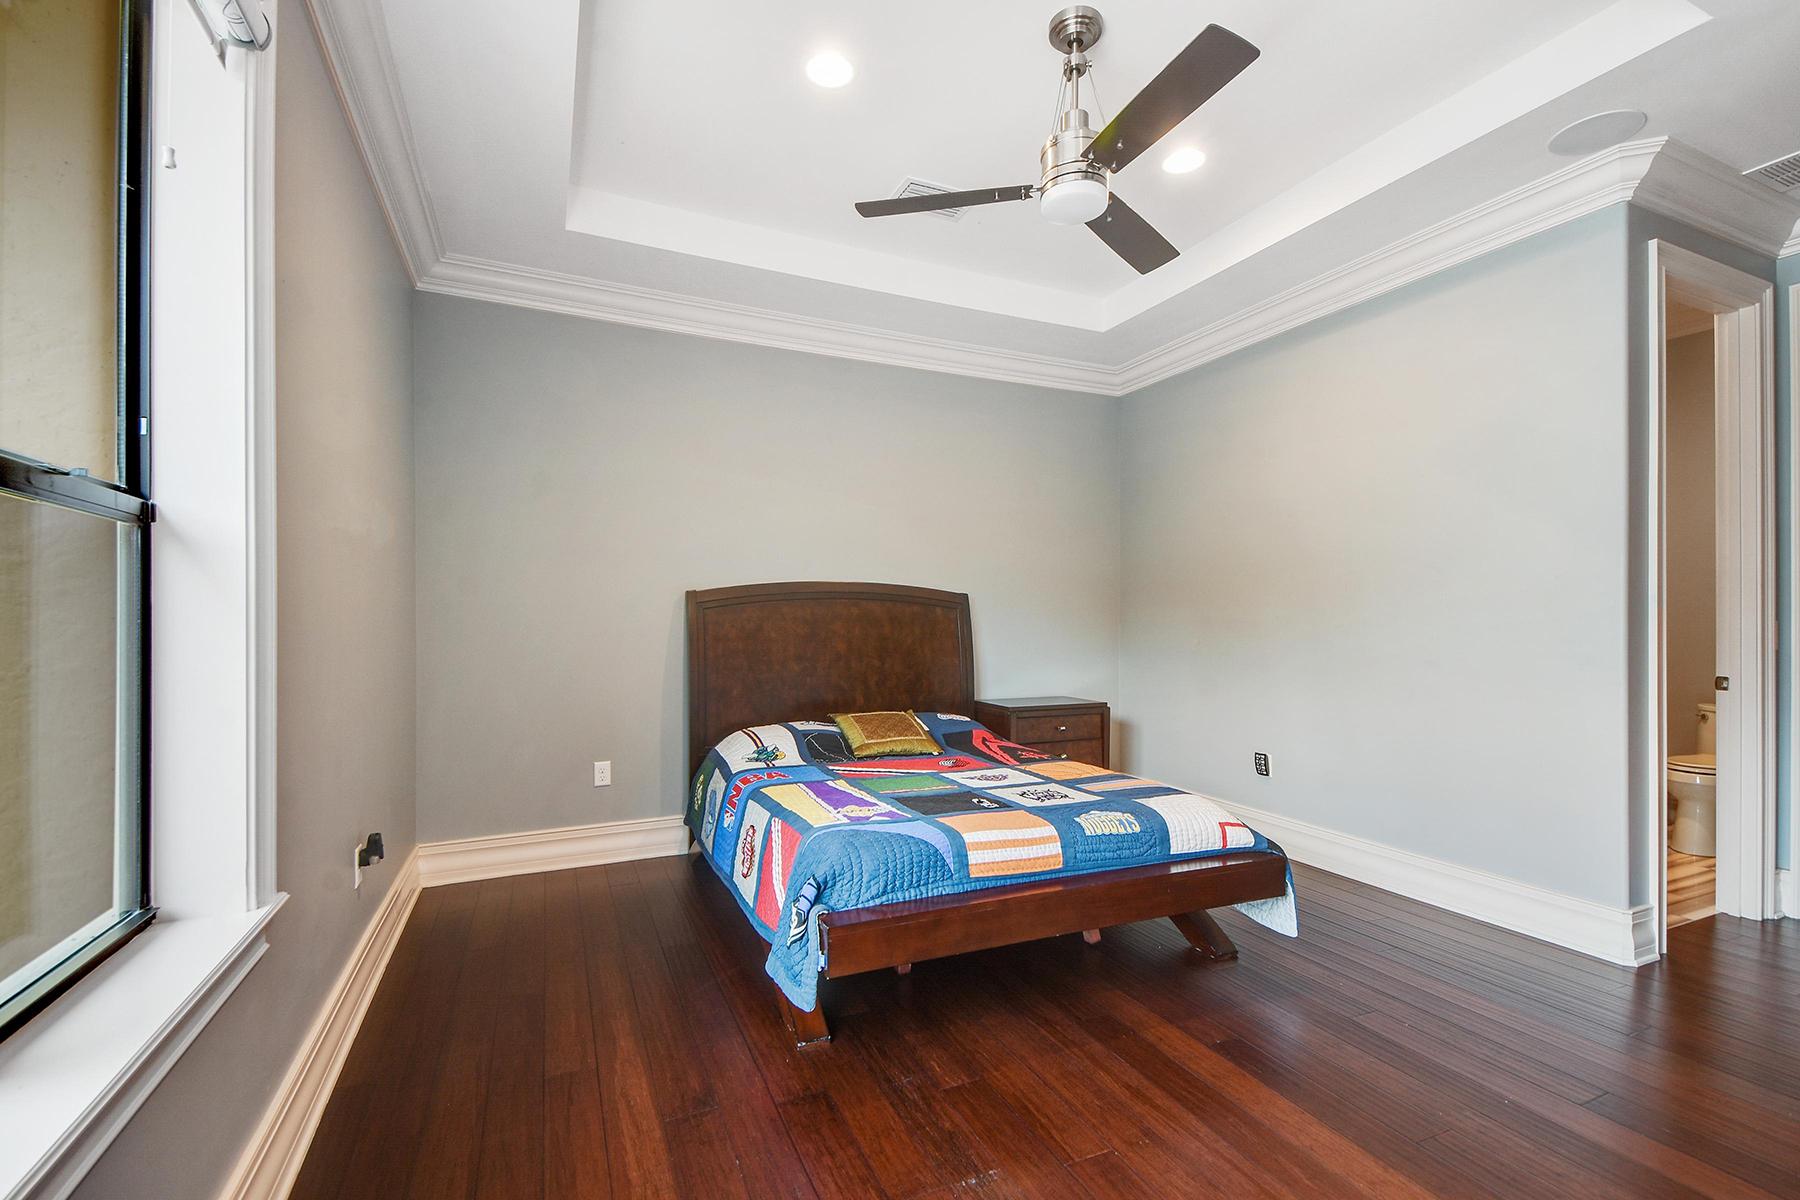 Additional photo for property listing at MOUNT DORA-ORLANDO 400  Lakeshore Pointe Blvd,  Mount Dora, Florida 32757 United States